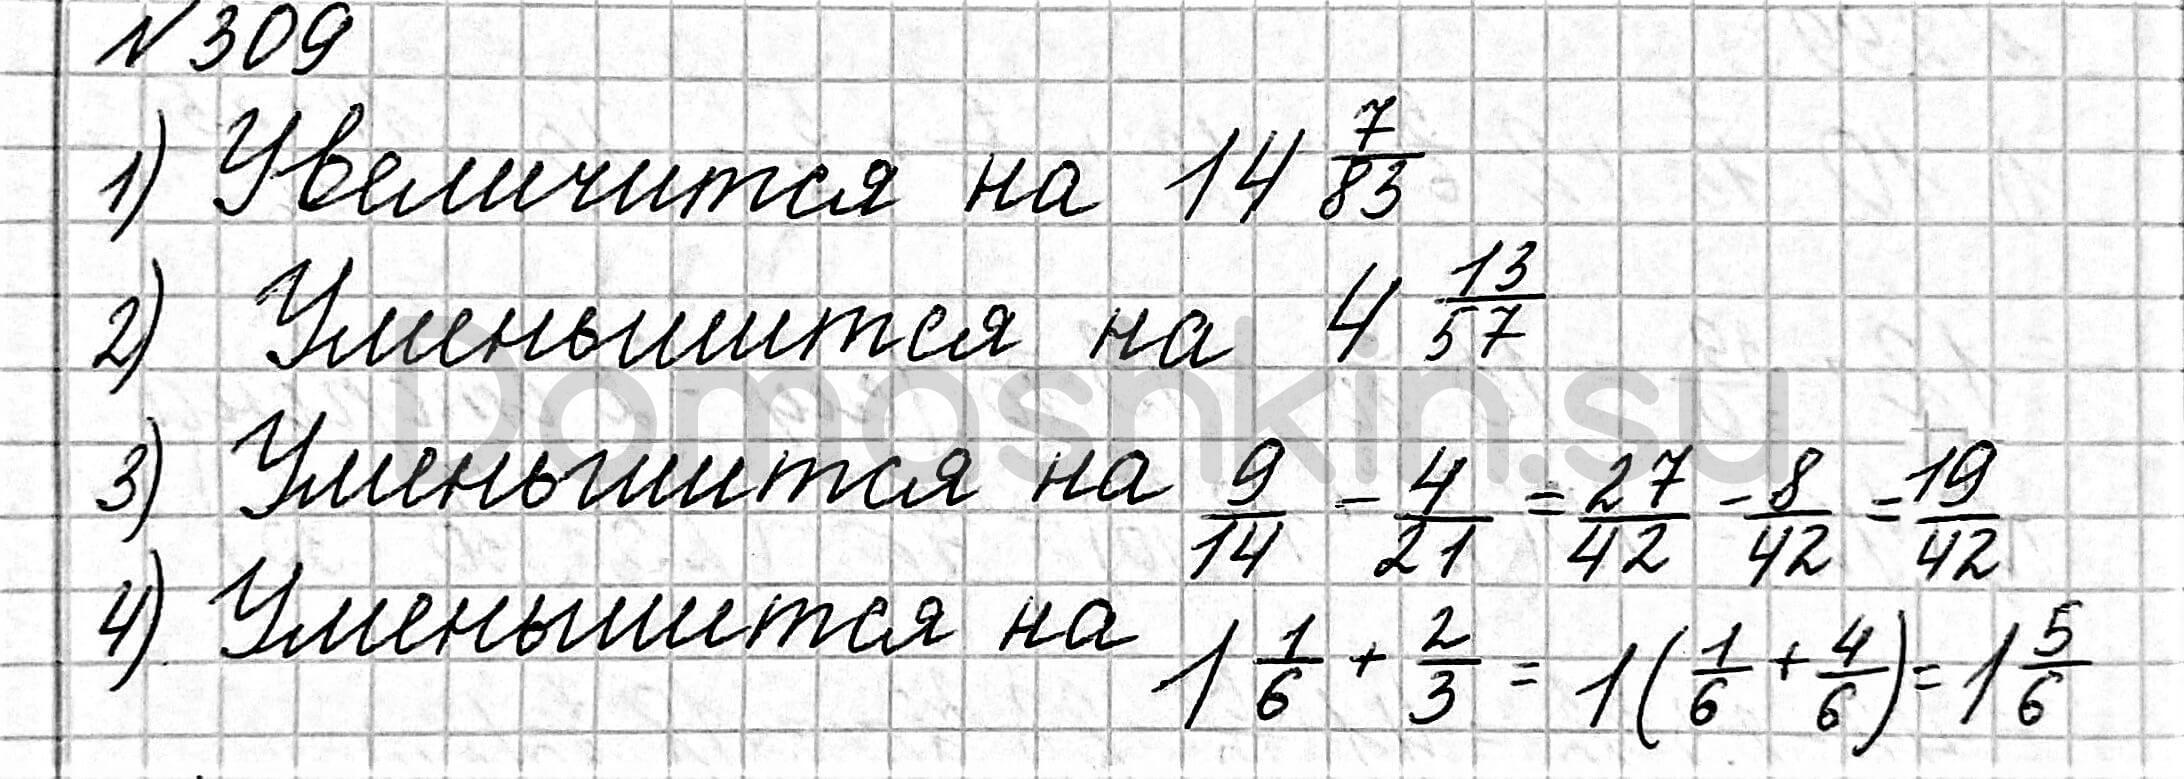 Математика 6 класс учебник Мерзляк номер 309 решение